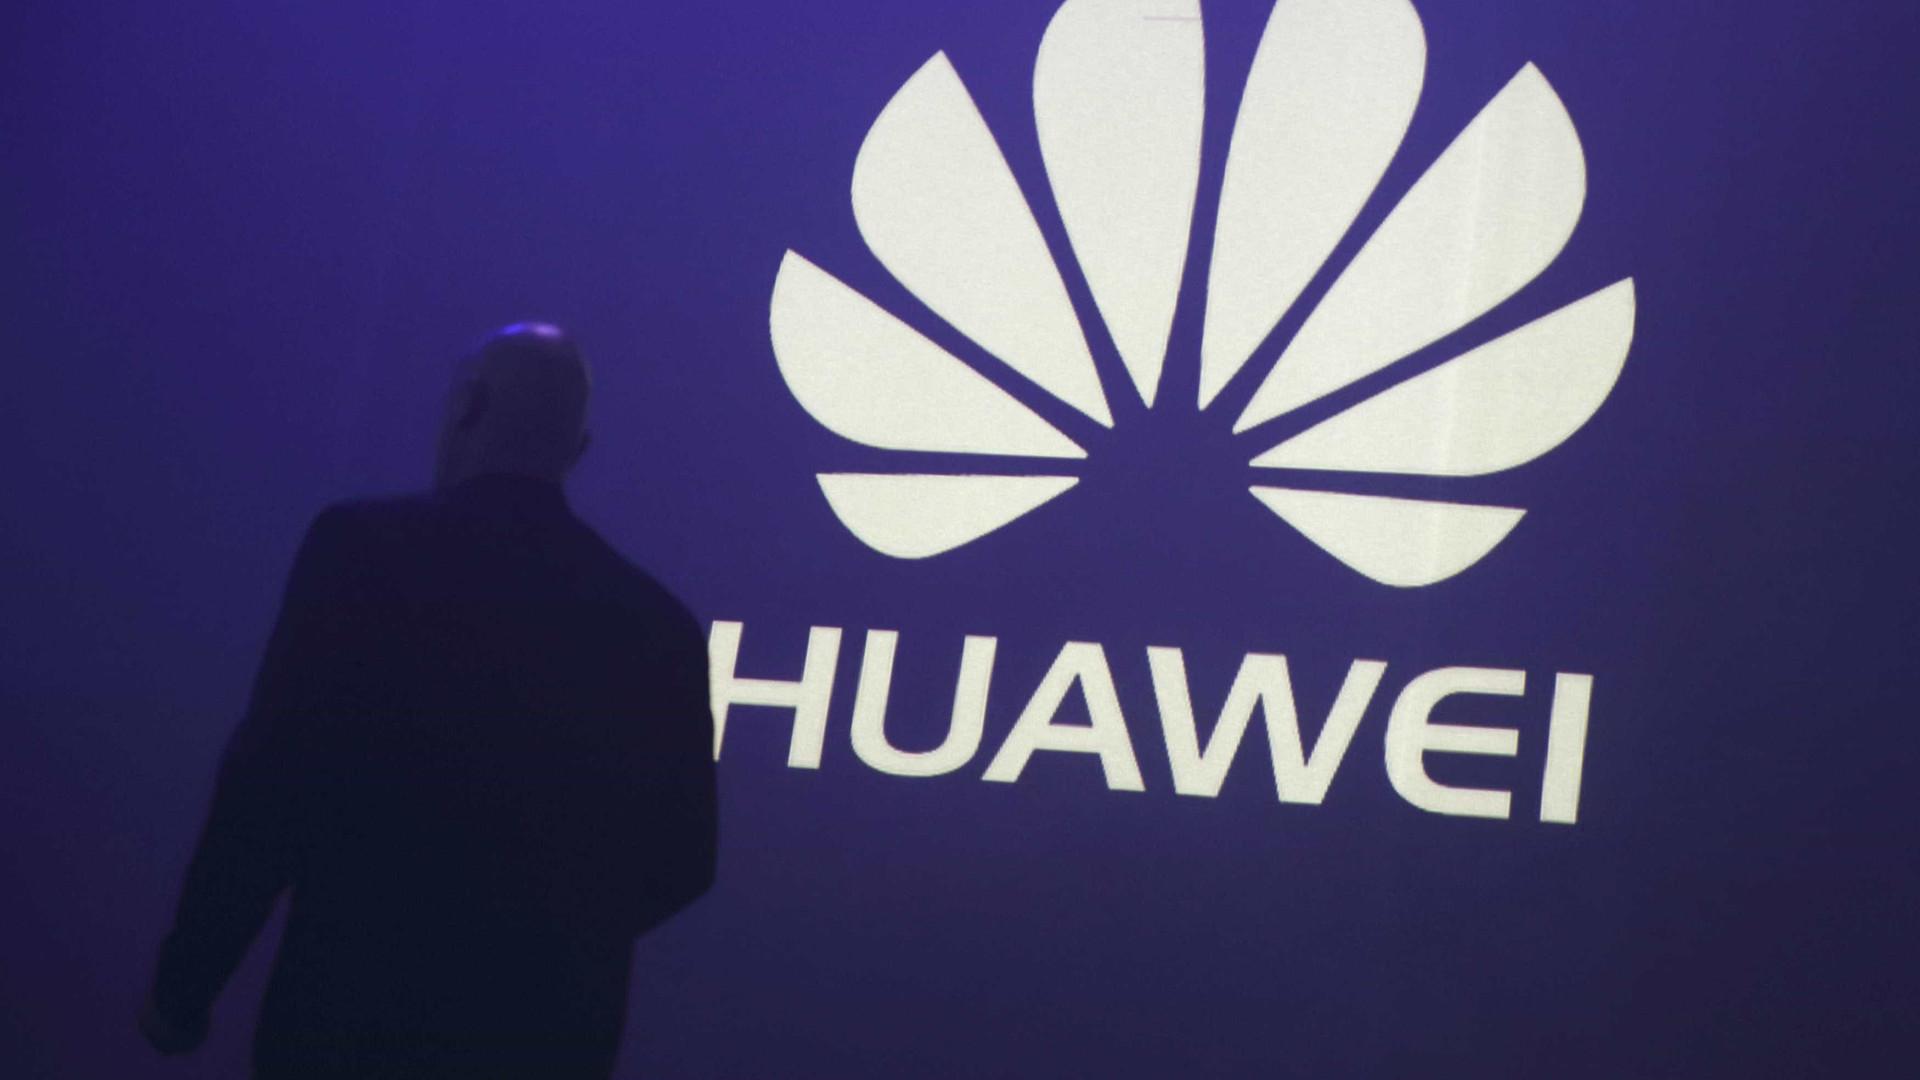 Voltou a ser avistada a face frontal do novo topo de gama da Huawei